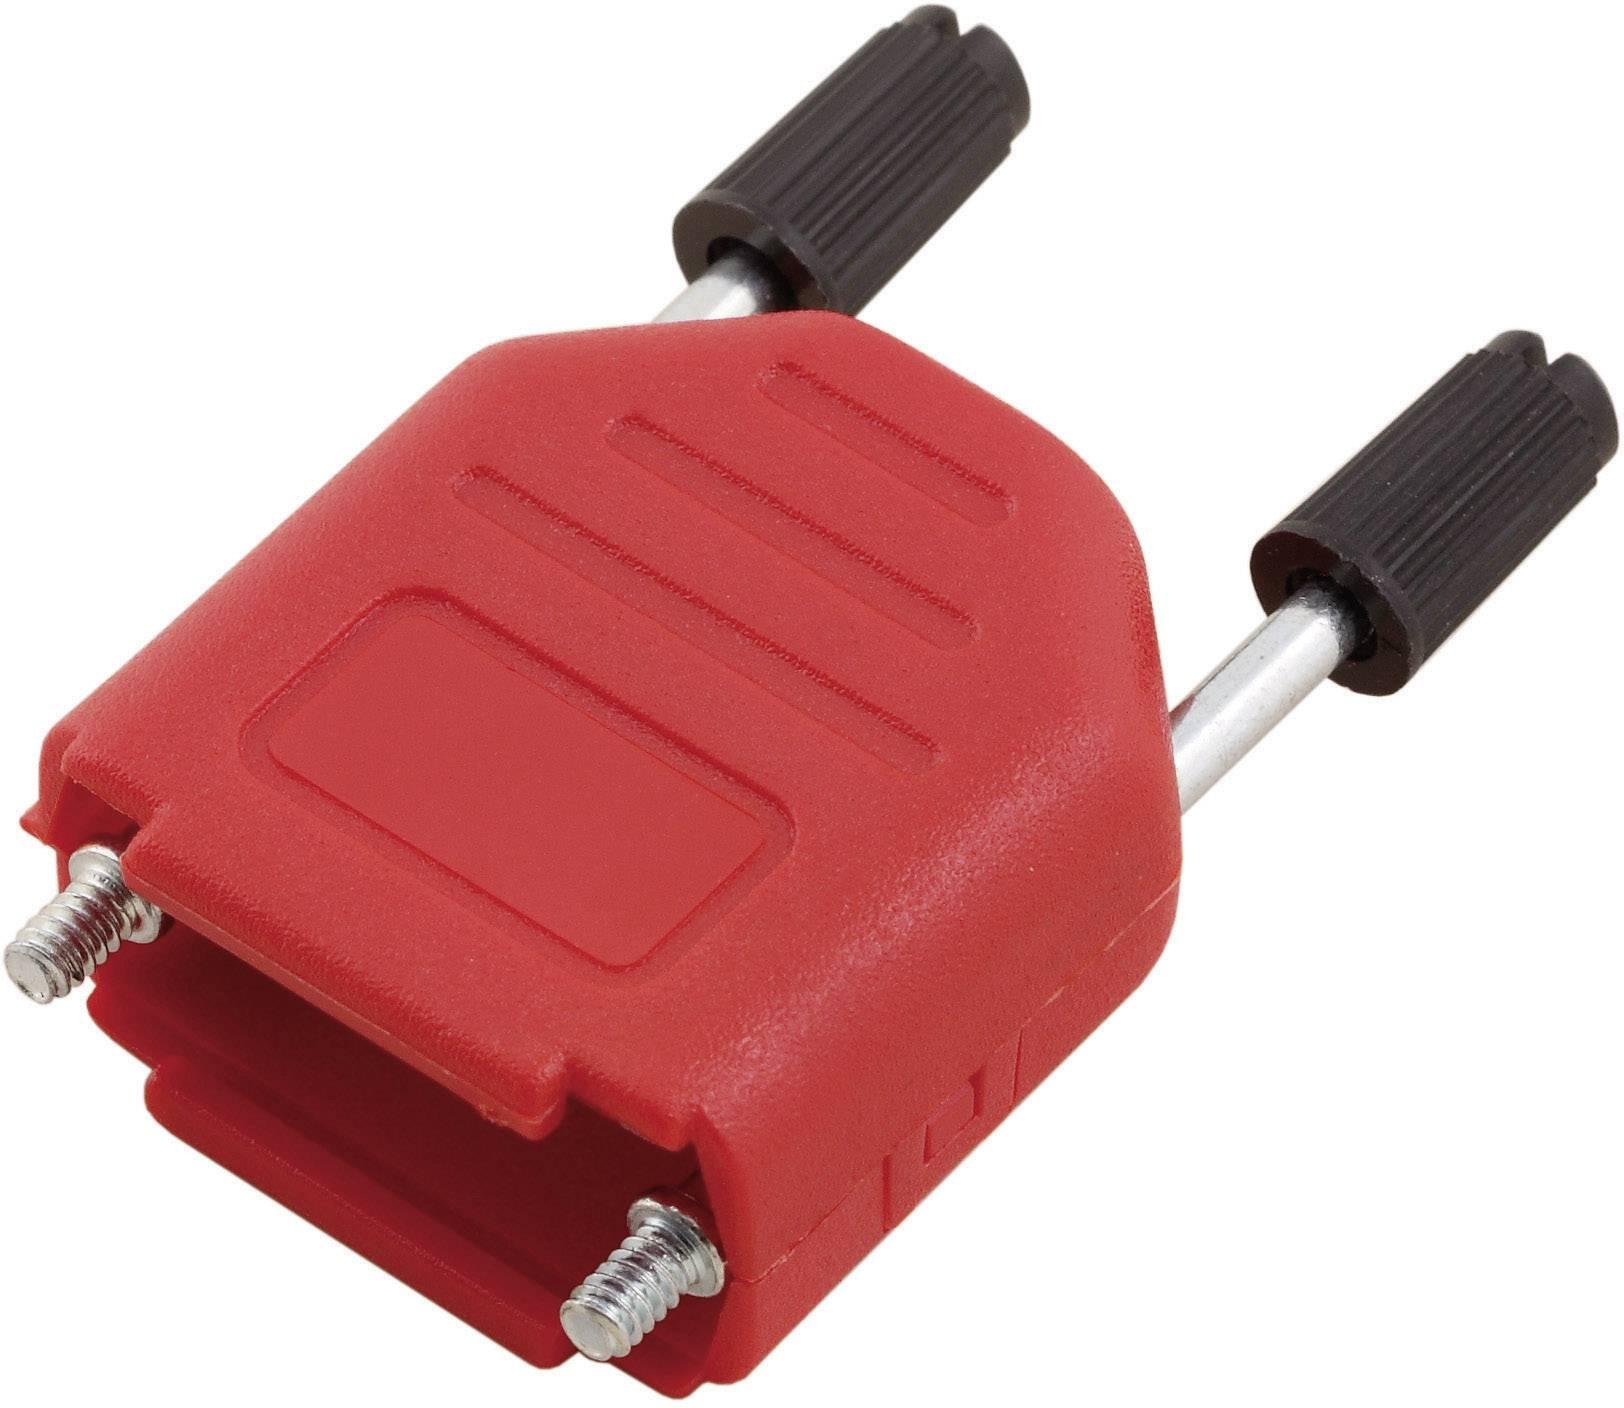 D-SUB pouzdro MH Connectors MHDPPK15-R-K, Pólů: 15, plast, 180 °, červená, 1 ks